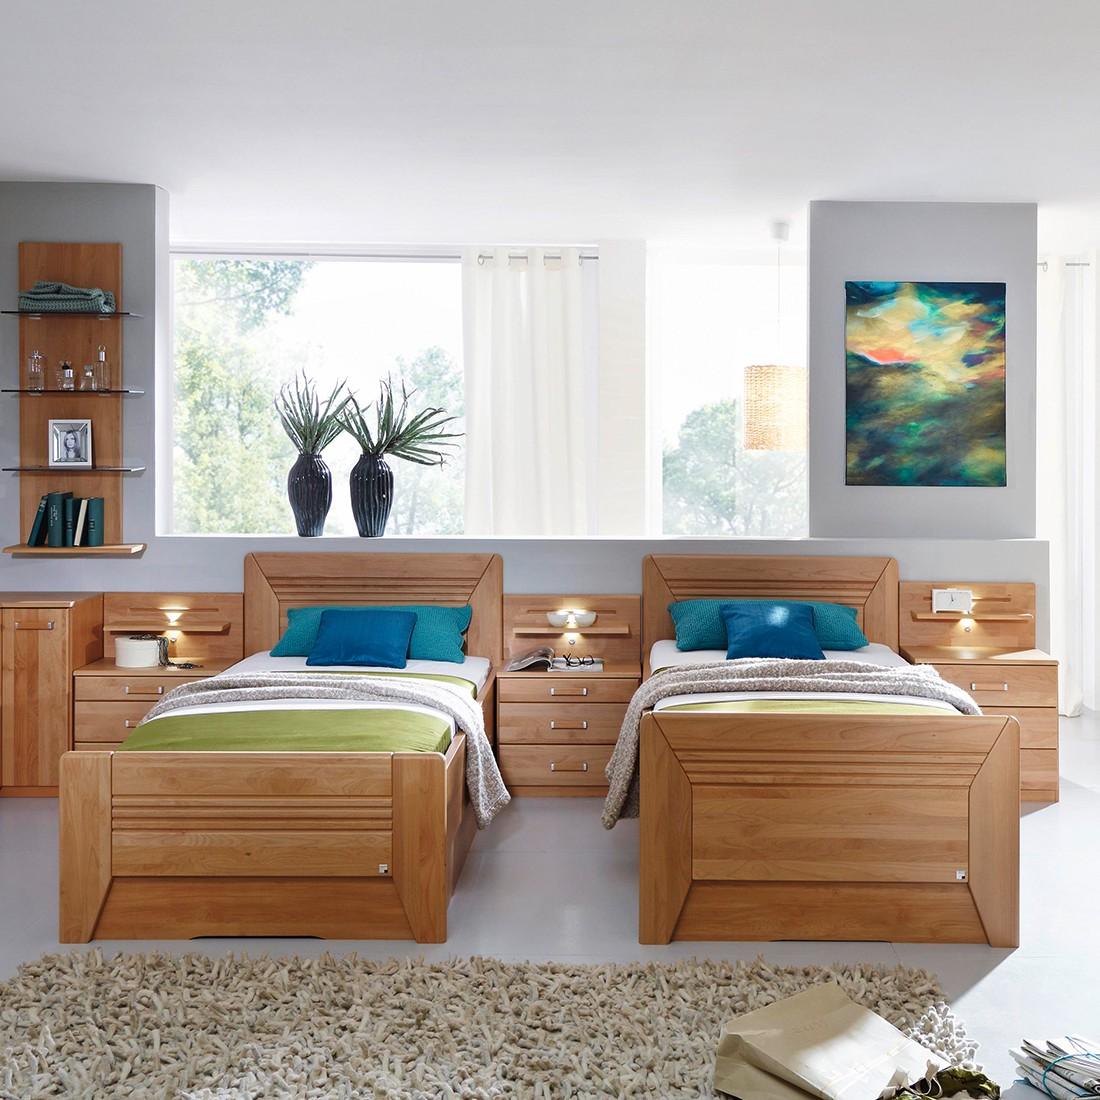 home24 Teilmassives Komfortbett Valerie III | Schlafzimmer > Betten > Komfortbetten